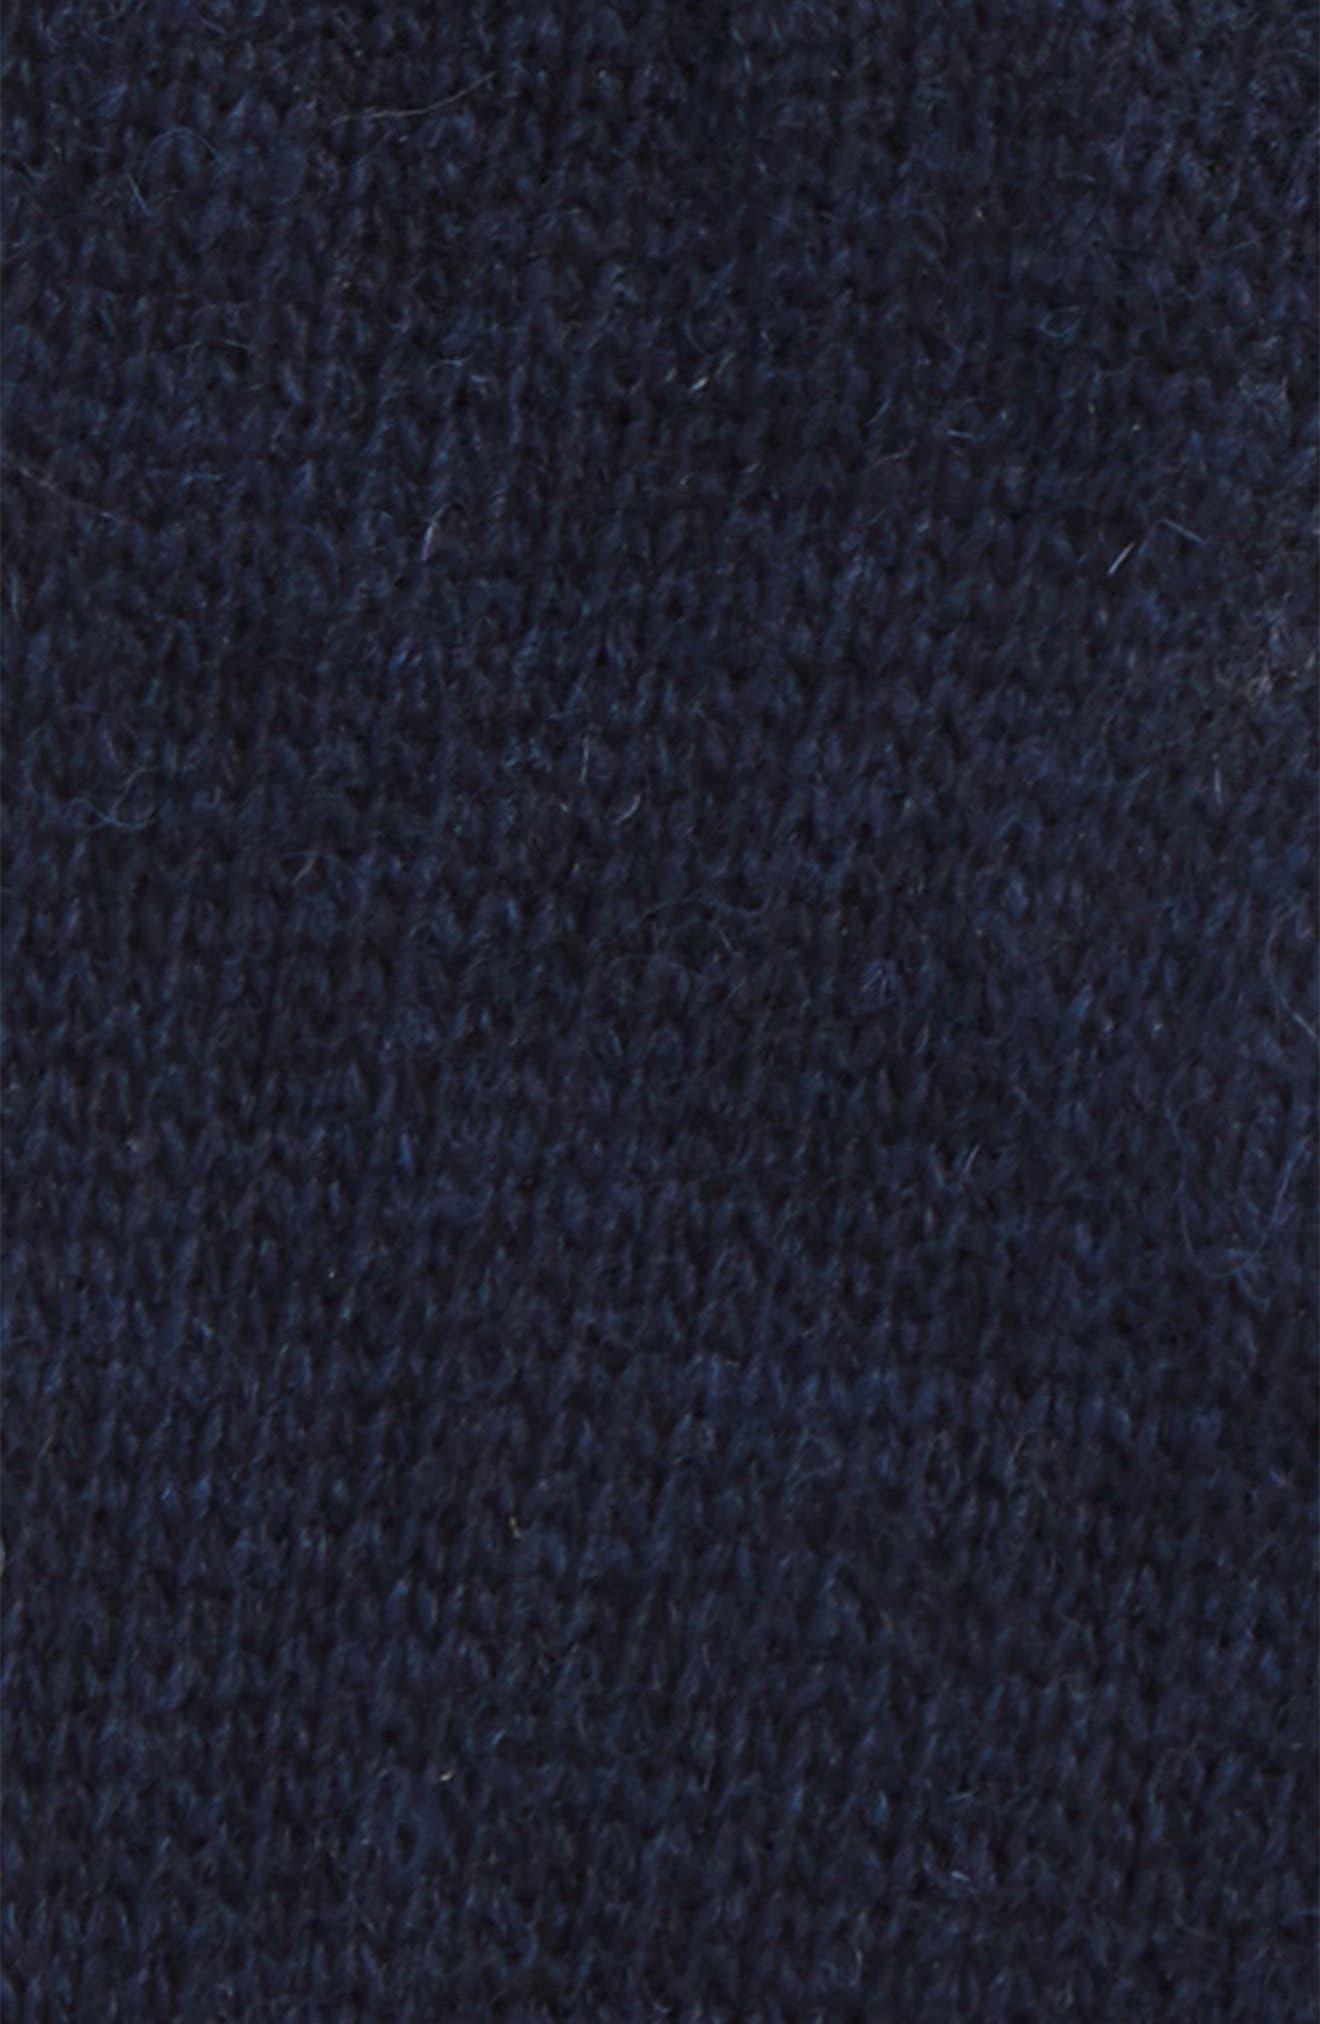 Carlton Stretch Wool Gloves,                             Alternate thumbnail 2, color,                             NAVY